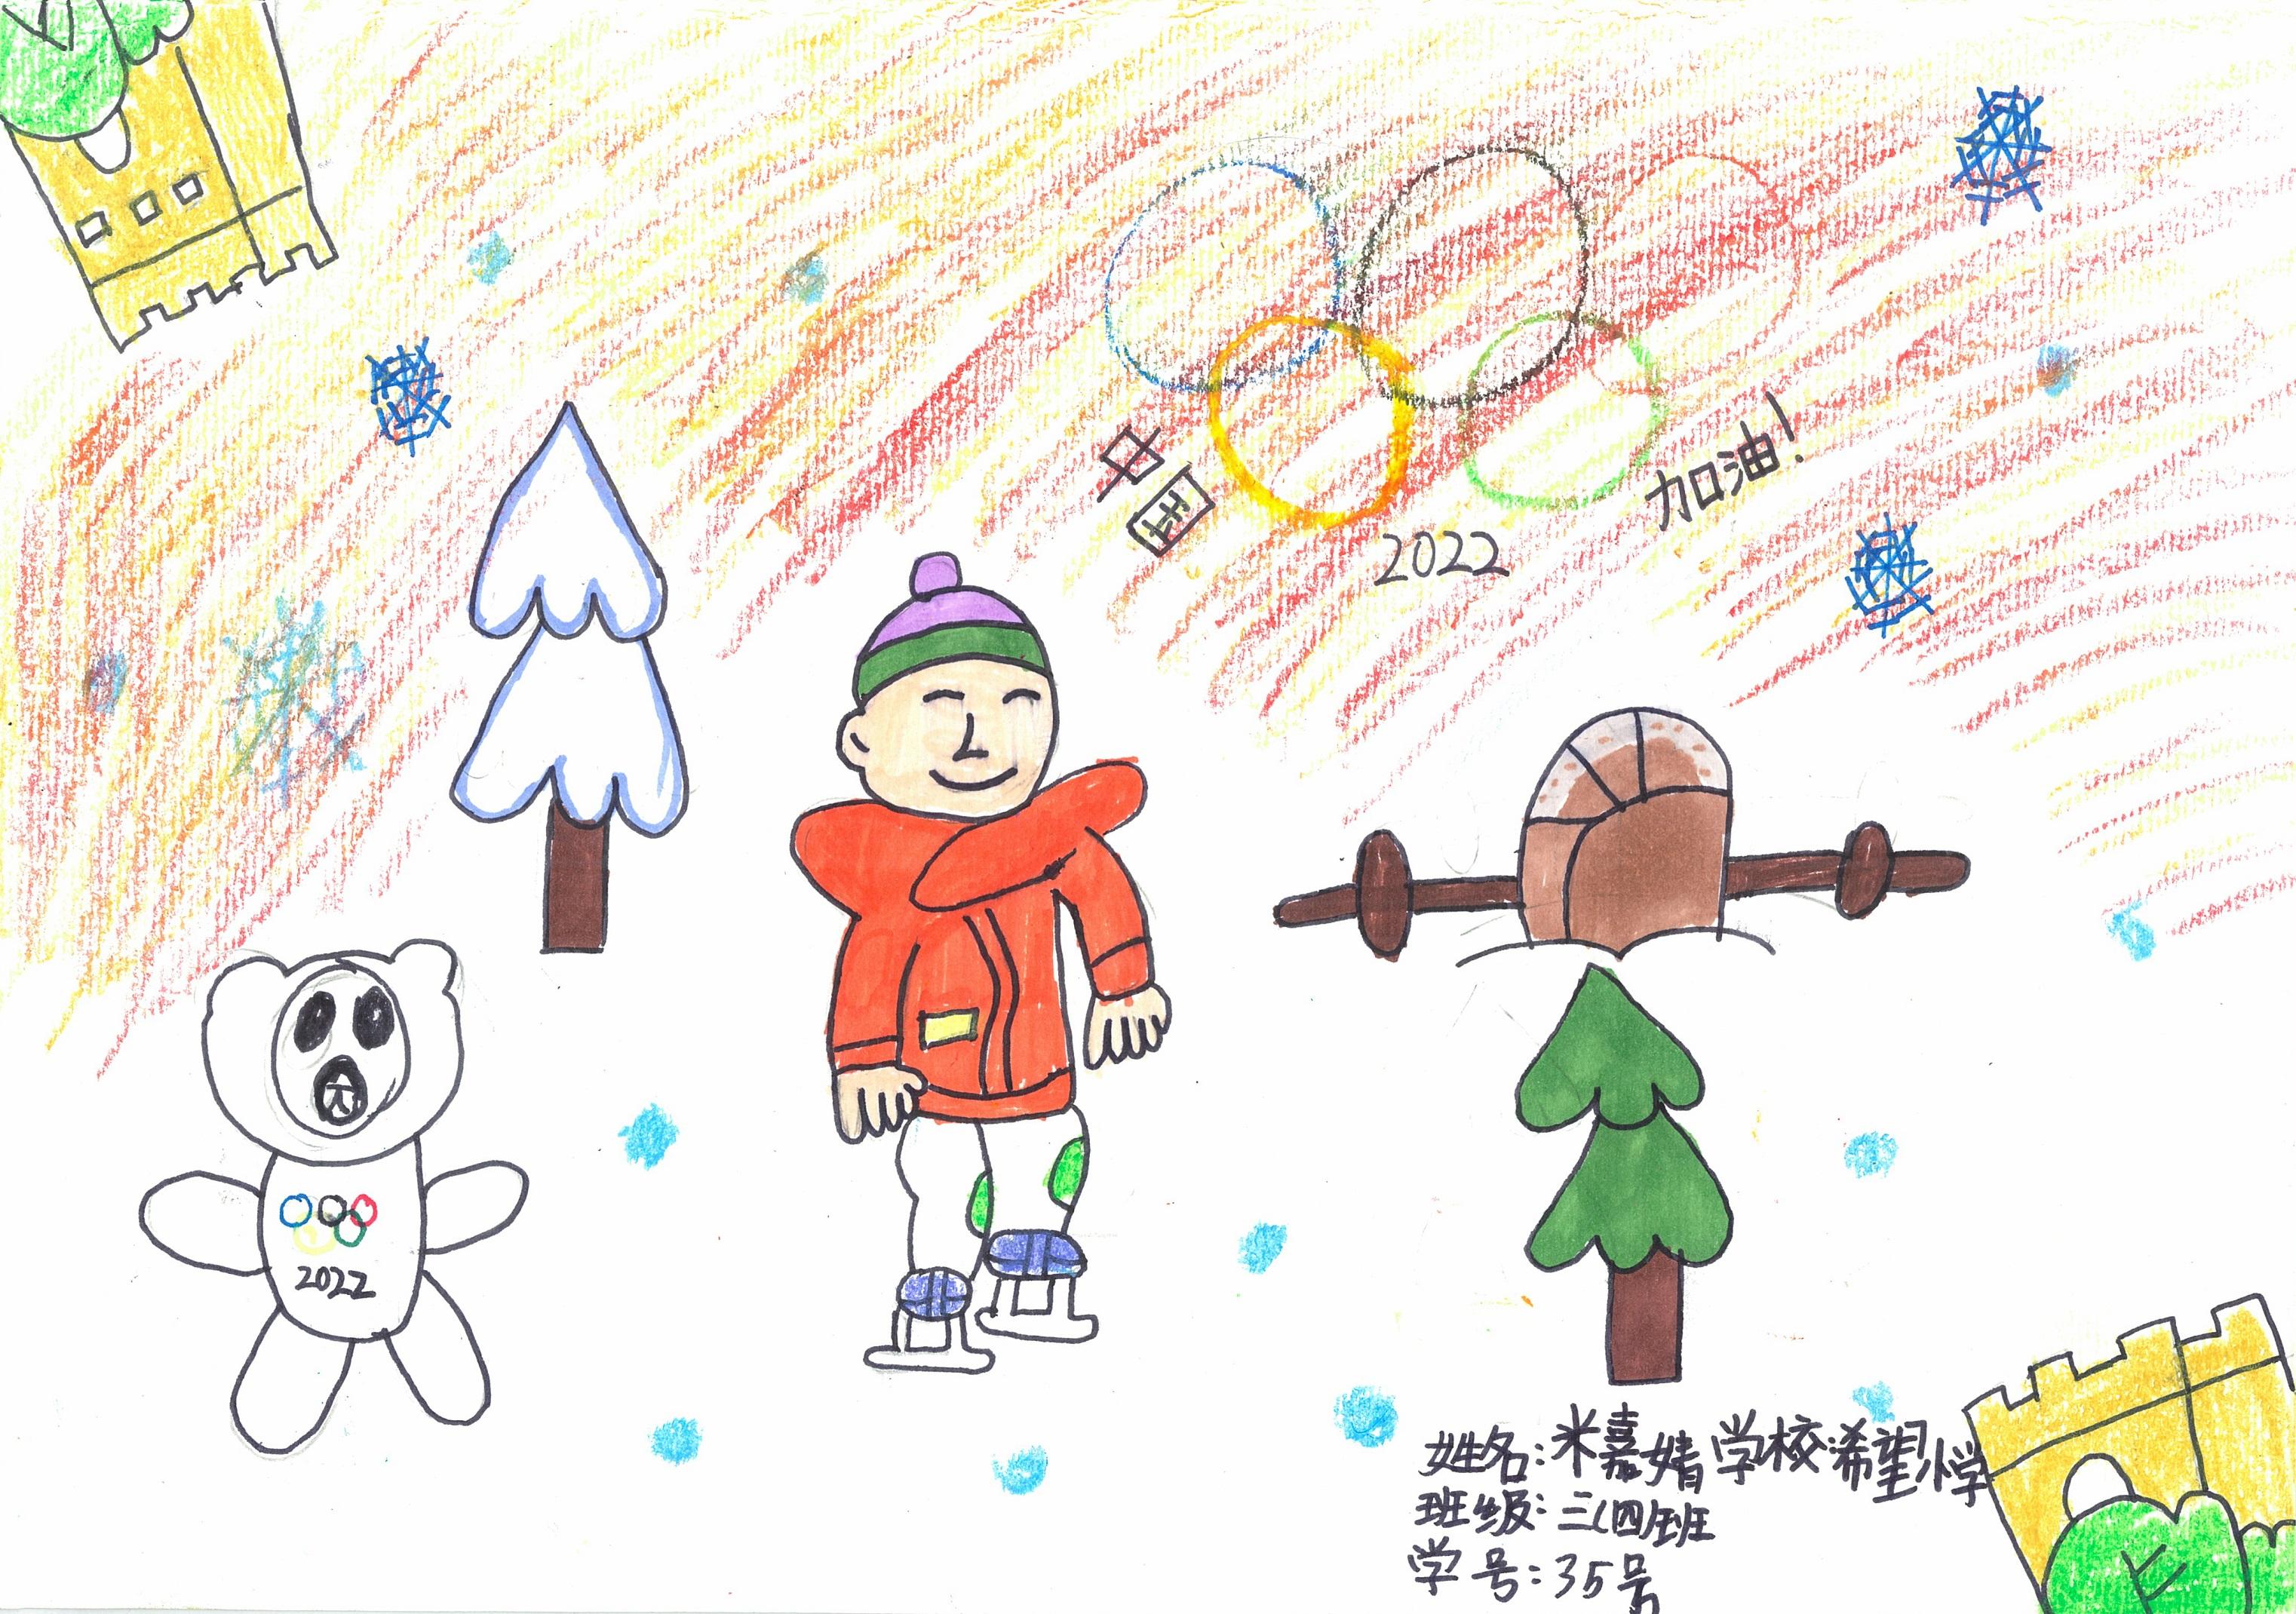 《我心中的冬奥荣耀时刻》Glory Moments Of The Winter Olympics In My Heart +米嘉婧 Mi Jiajing